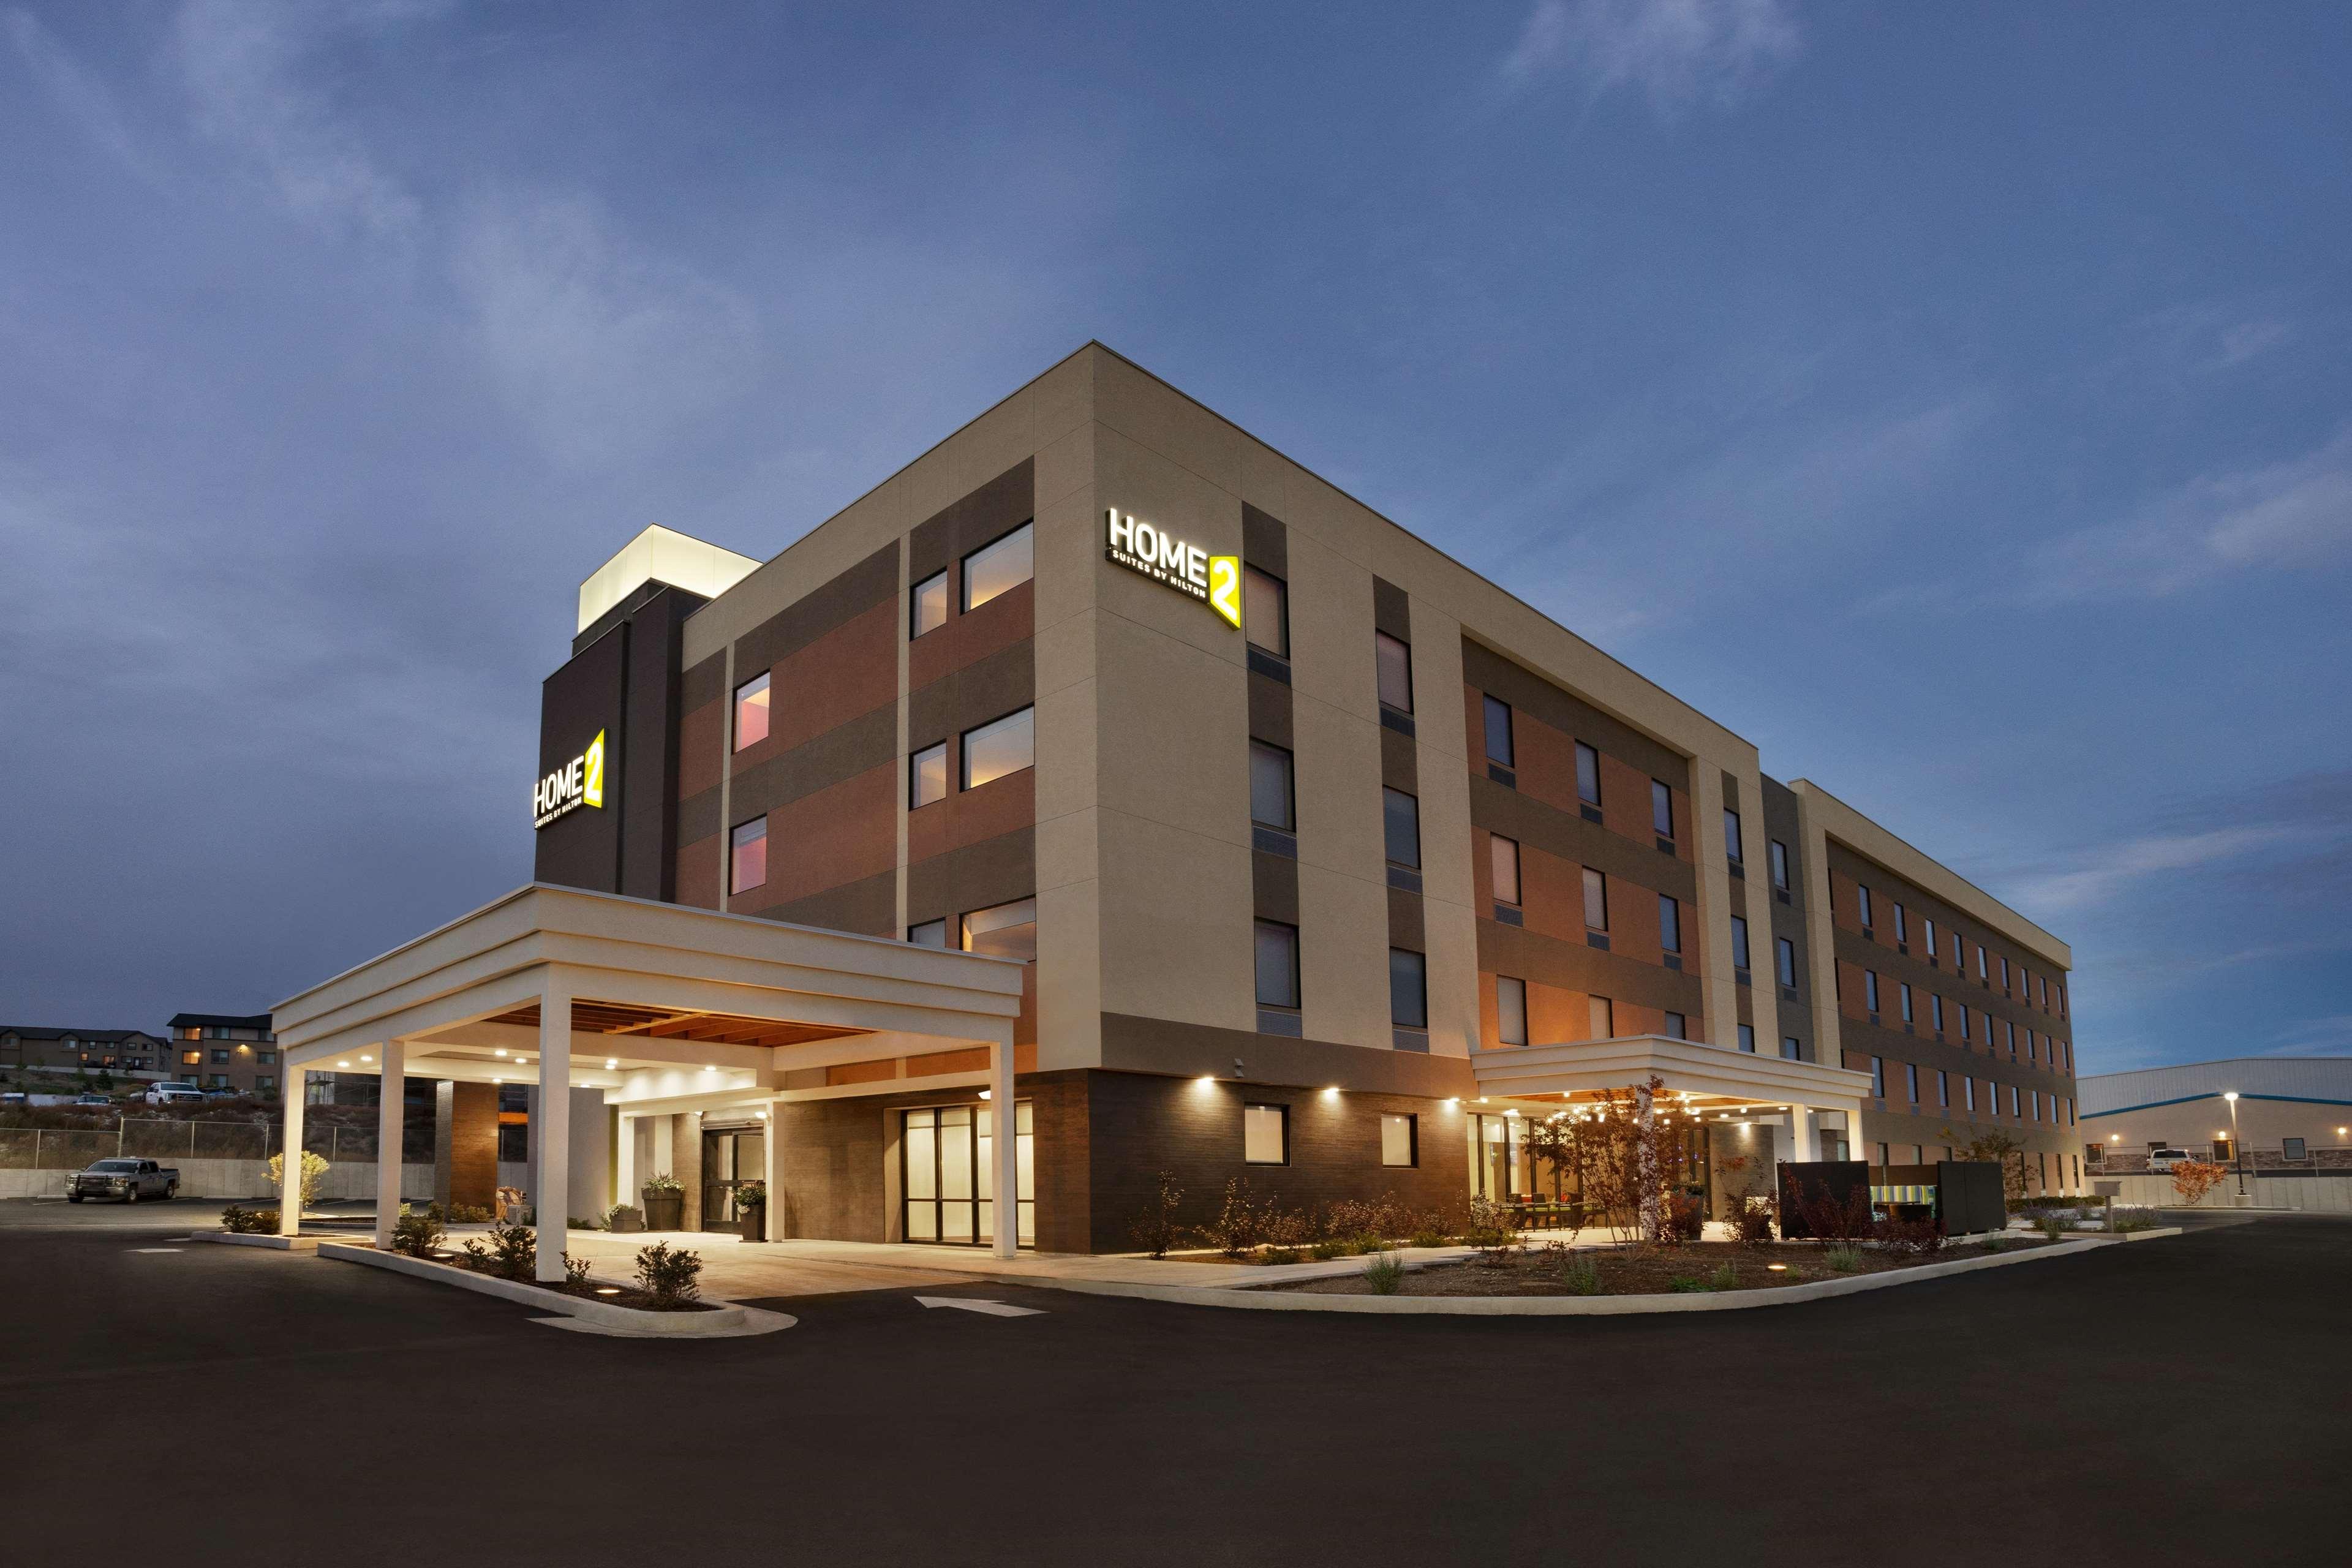 Home2 Suites by Hilton Elko image 5